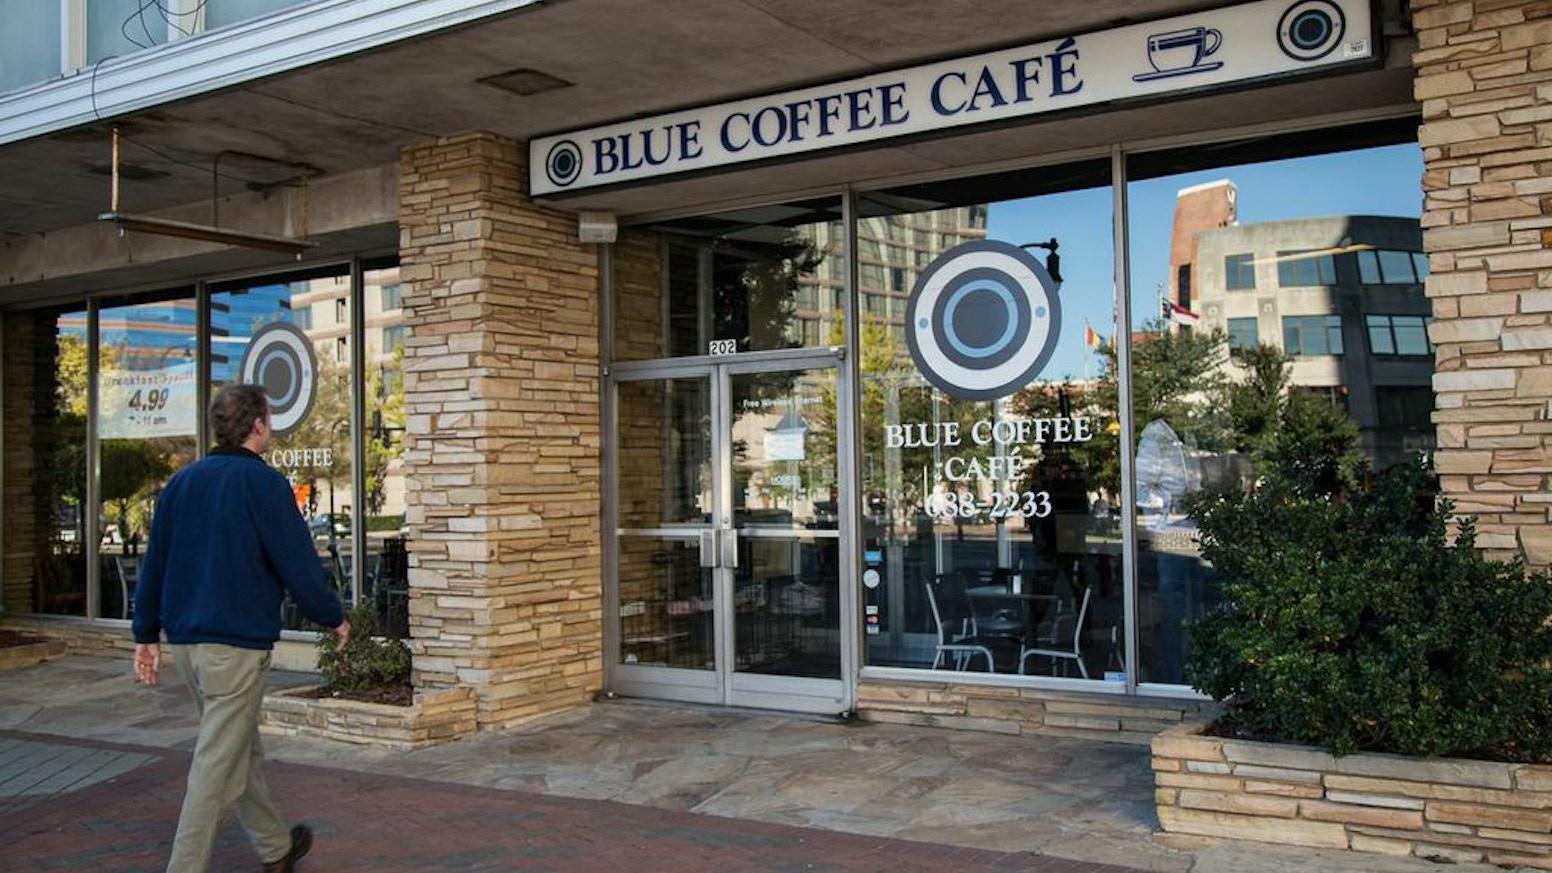 Blue Coffee A Community Cafe On Church Main